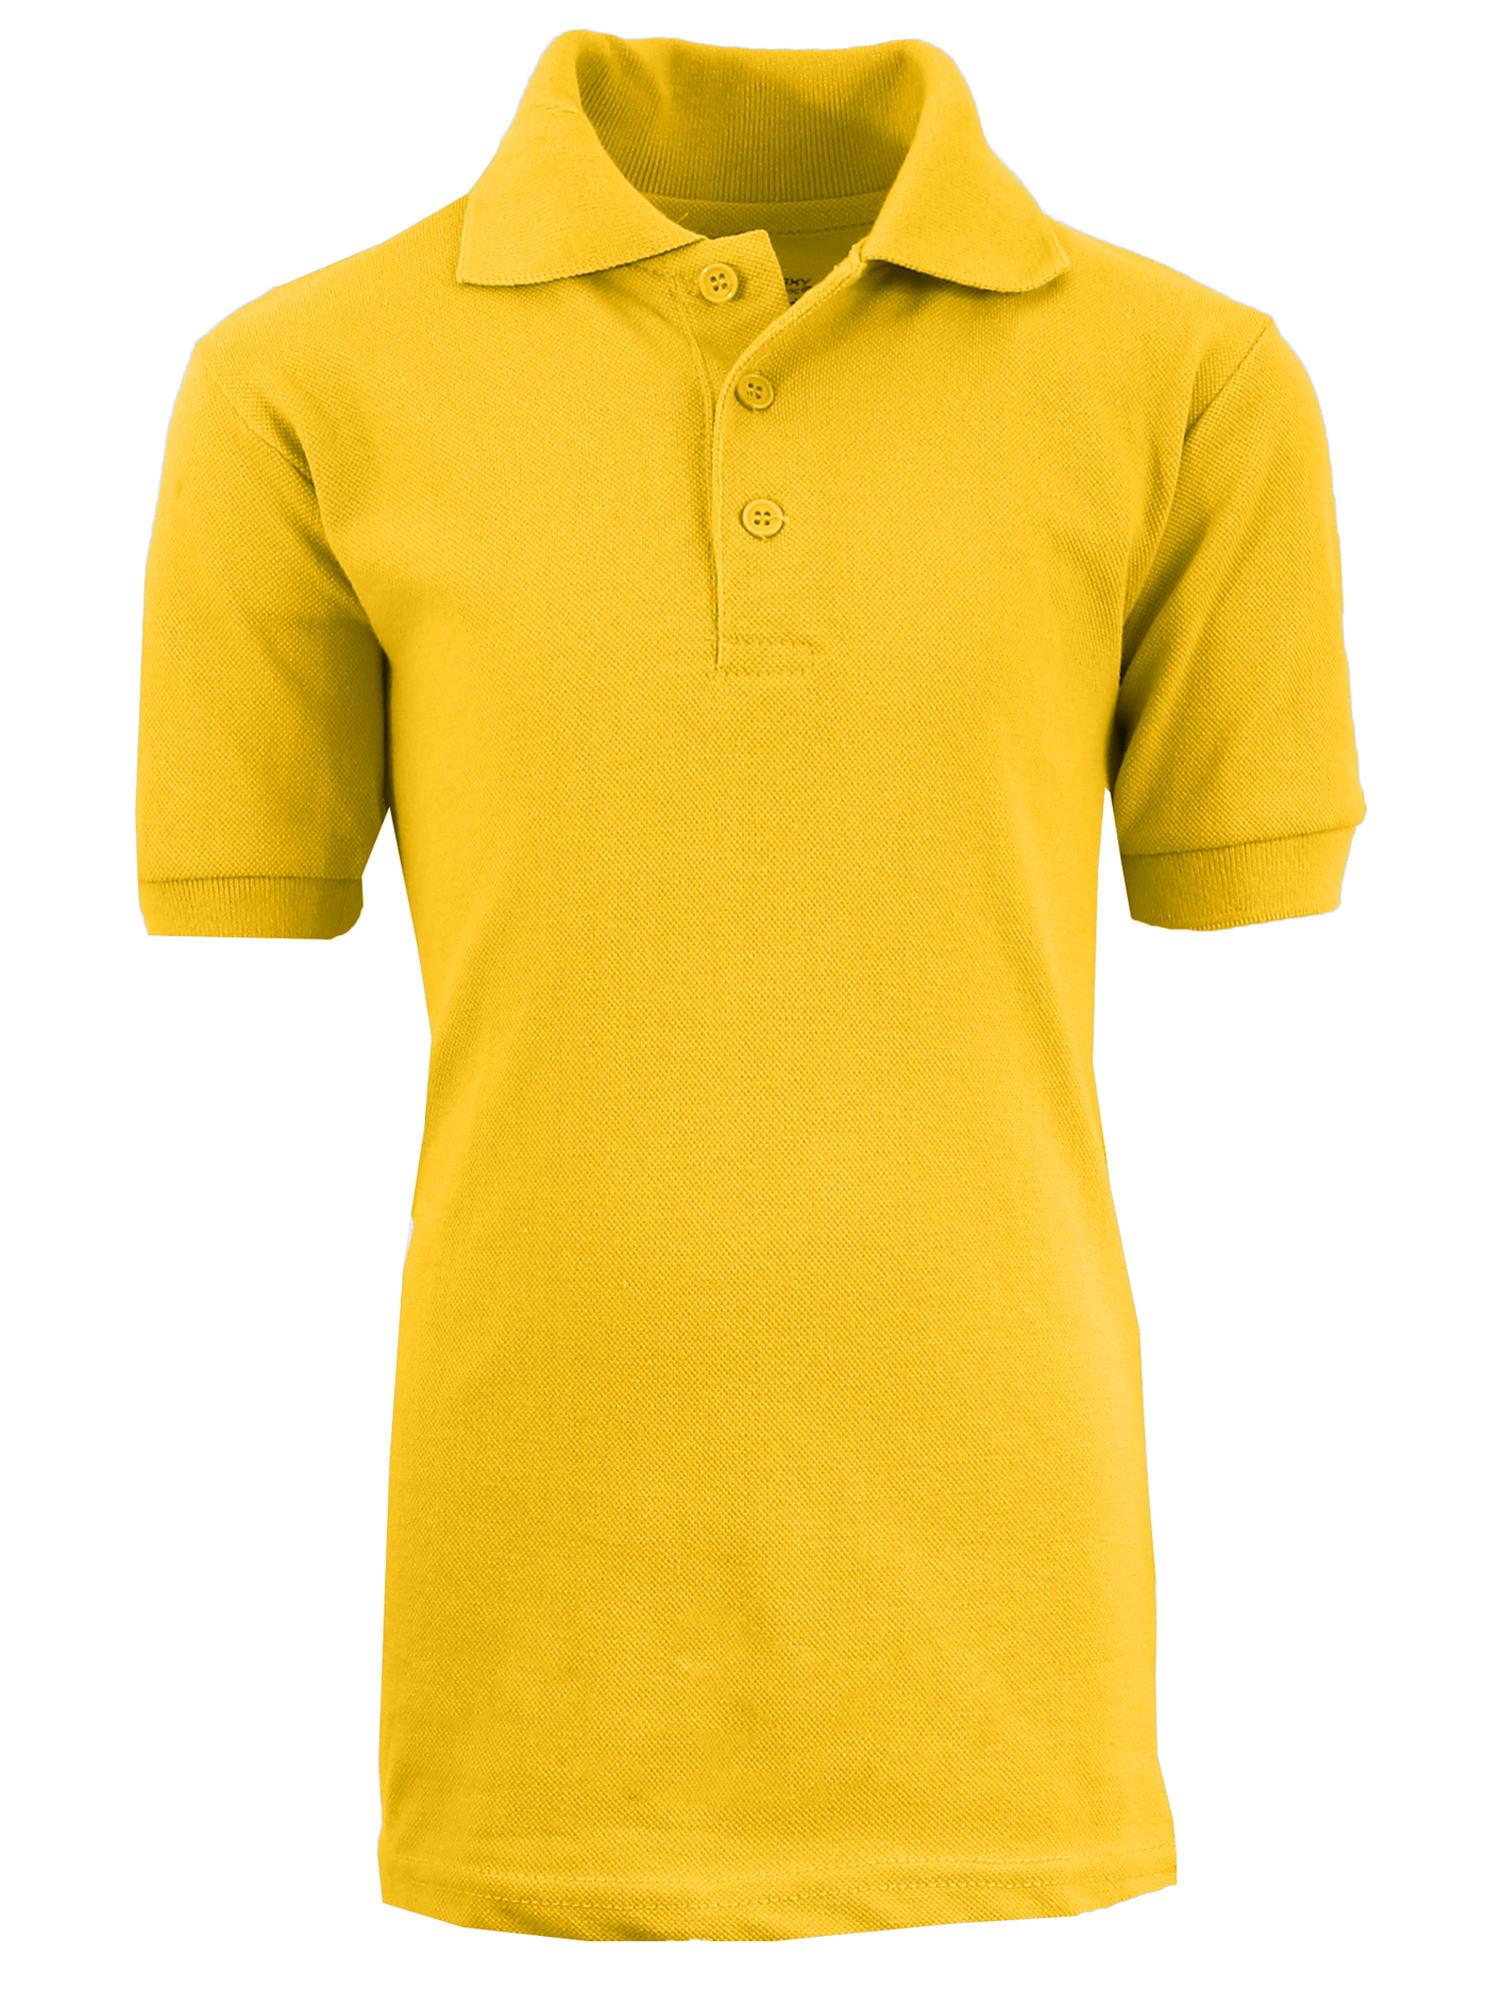 Boys Short Sleeve School Uniform Pique Polo Shirts - Sizes 4-20